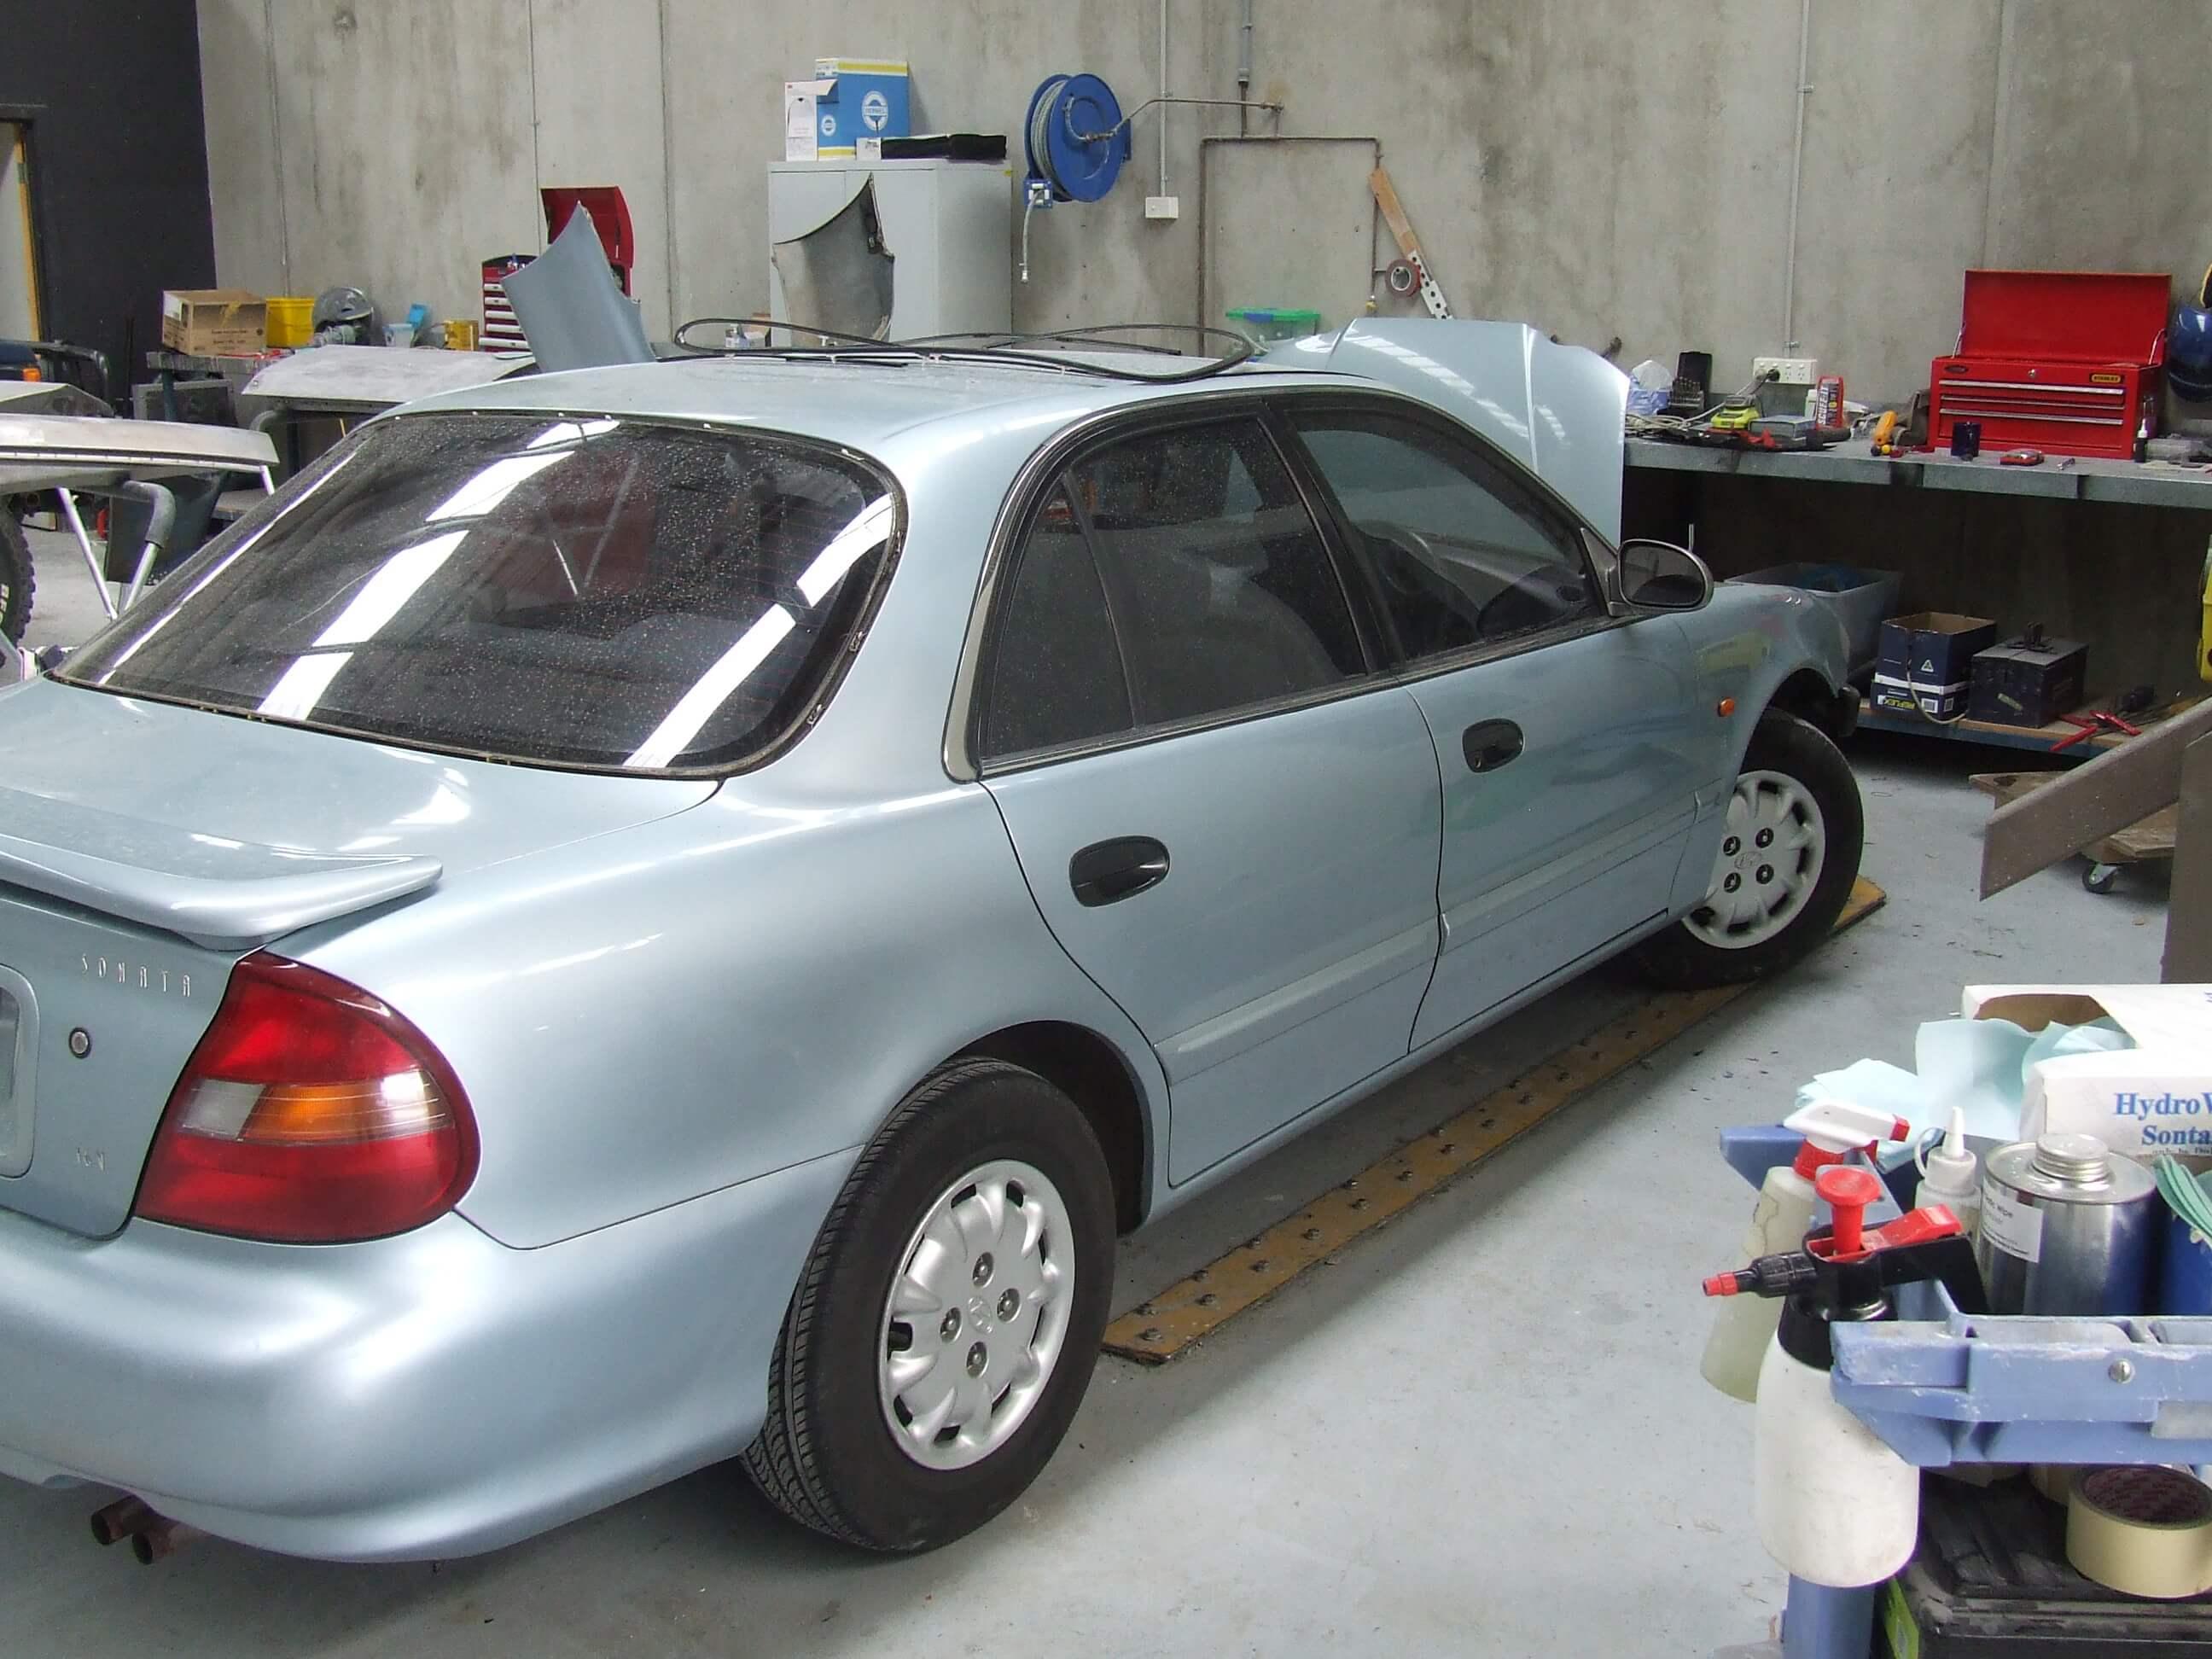 Hyundai Sonata being prepared for respray